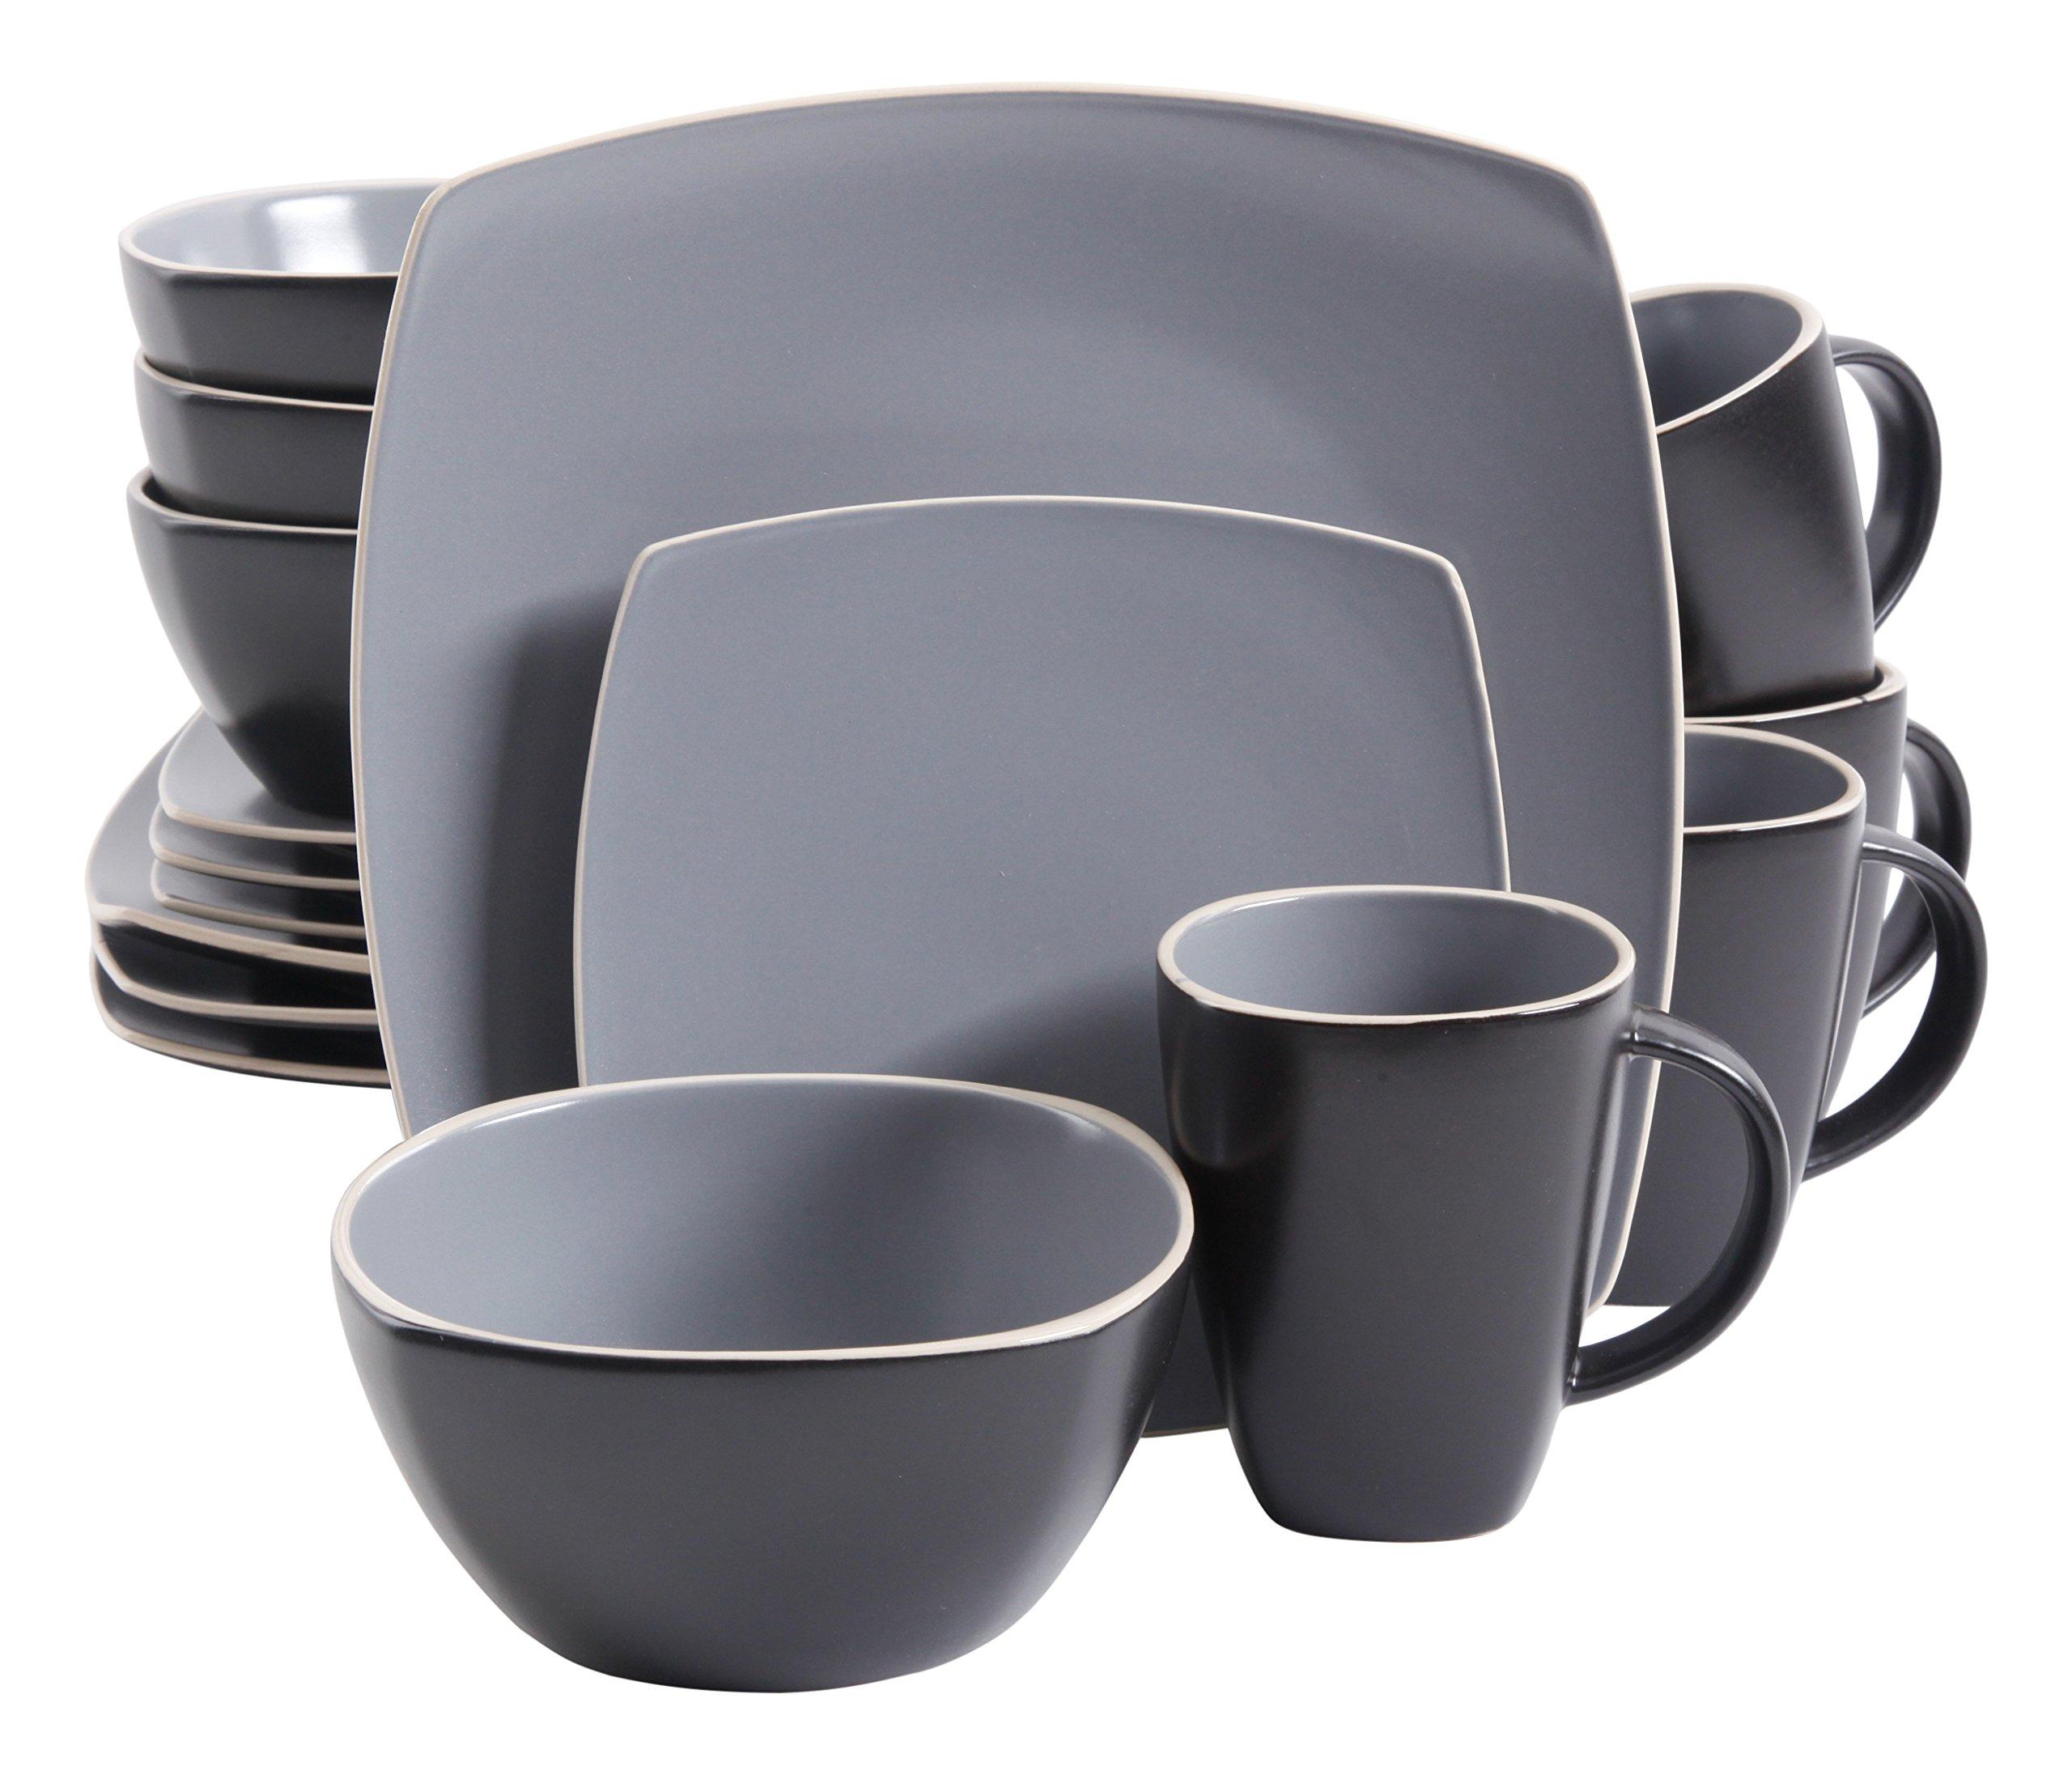 Gibson Home Soho Lounge Matte 16 Piece Dinnerware Set, Grey